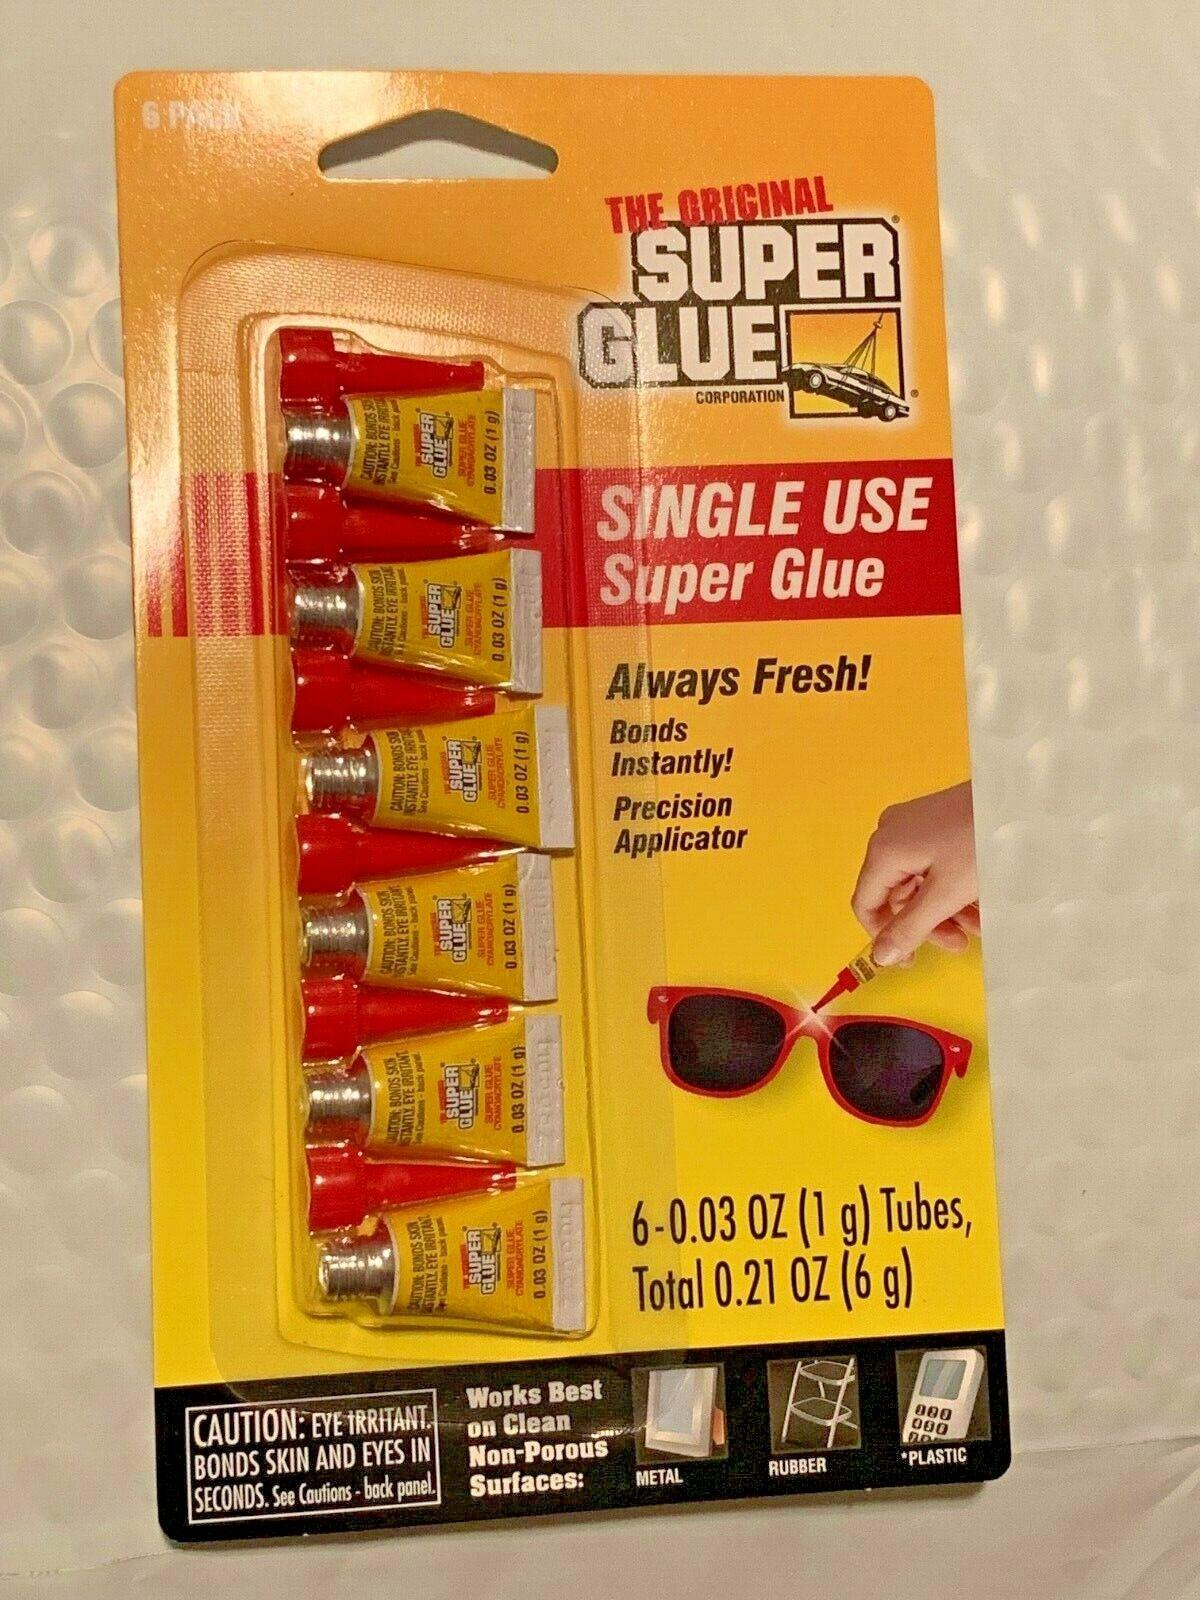 The Original Super Glue High Strength Cyanoacrylate All Purpose Super Glue 6 pk Adhesives & Tape